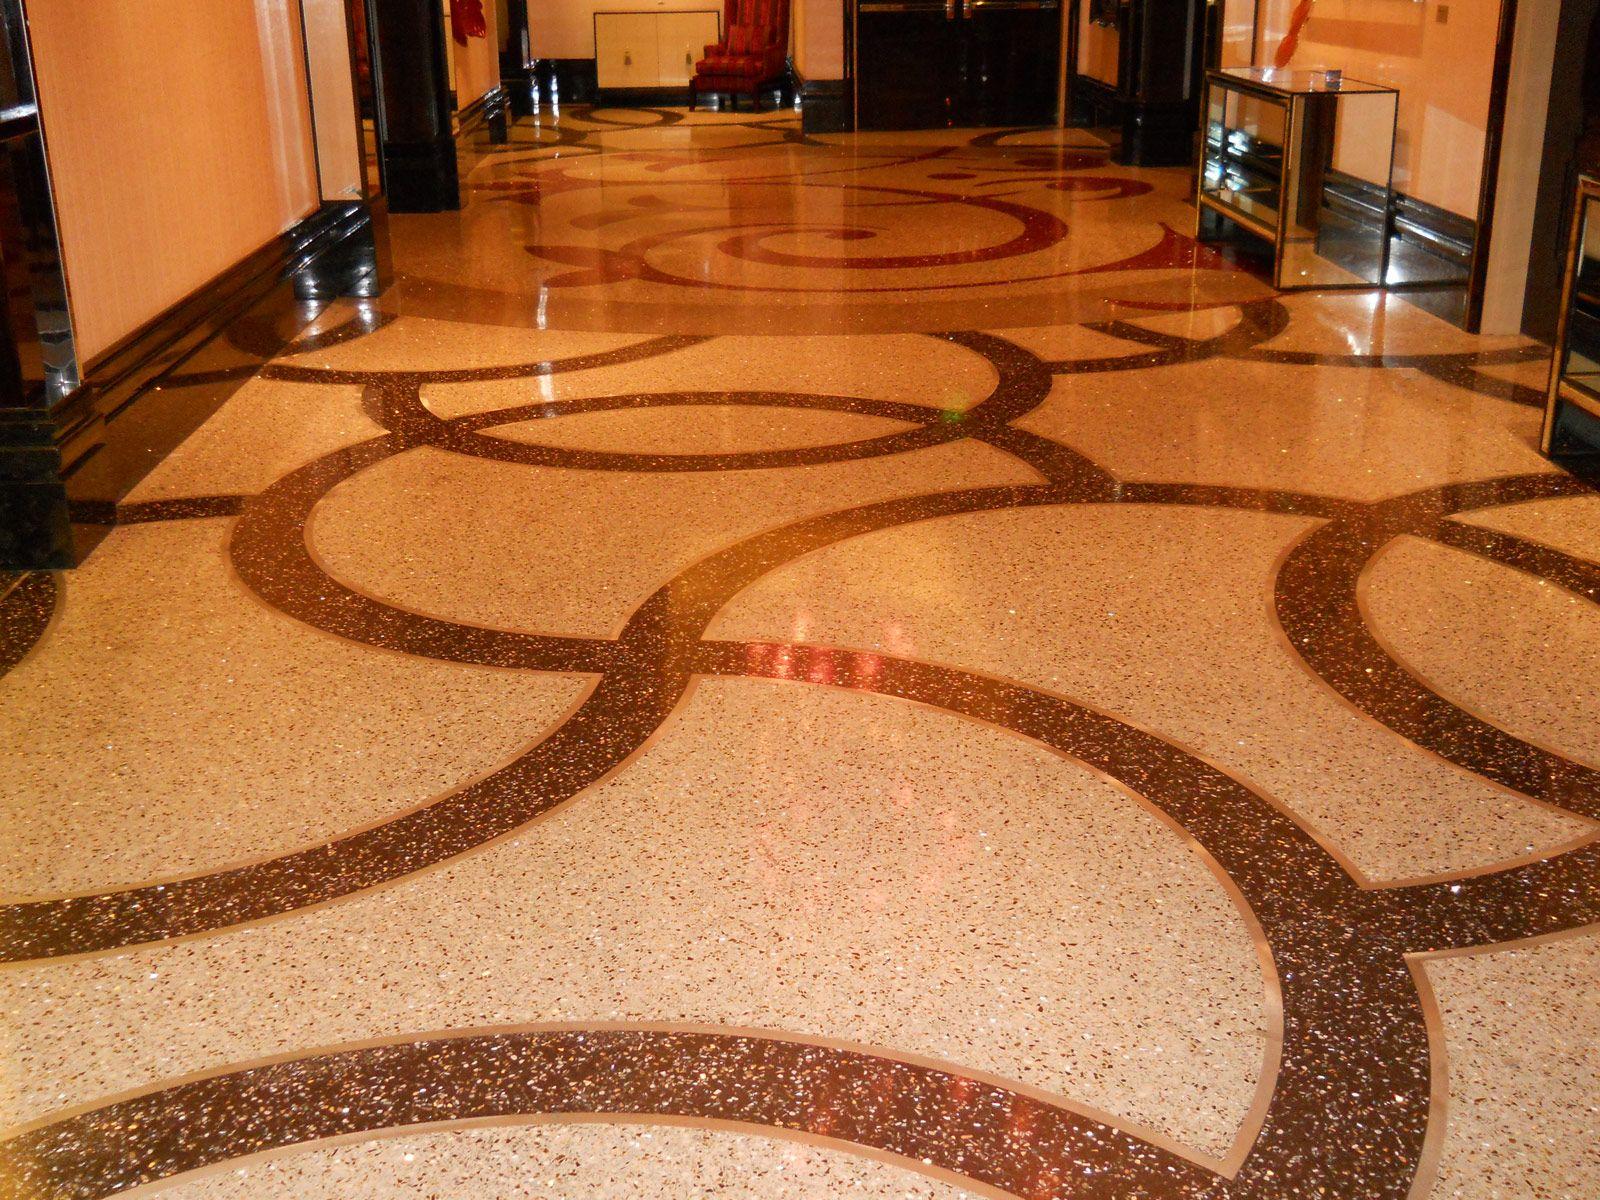 Floors With Decorative Elements Cosmopolitan Las Vegas